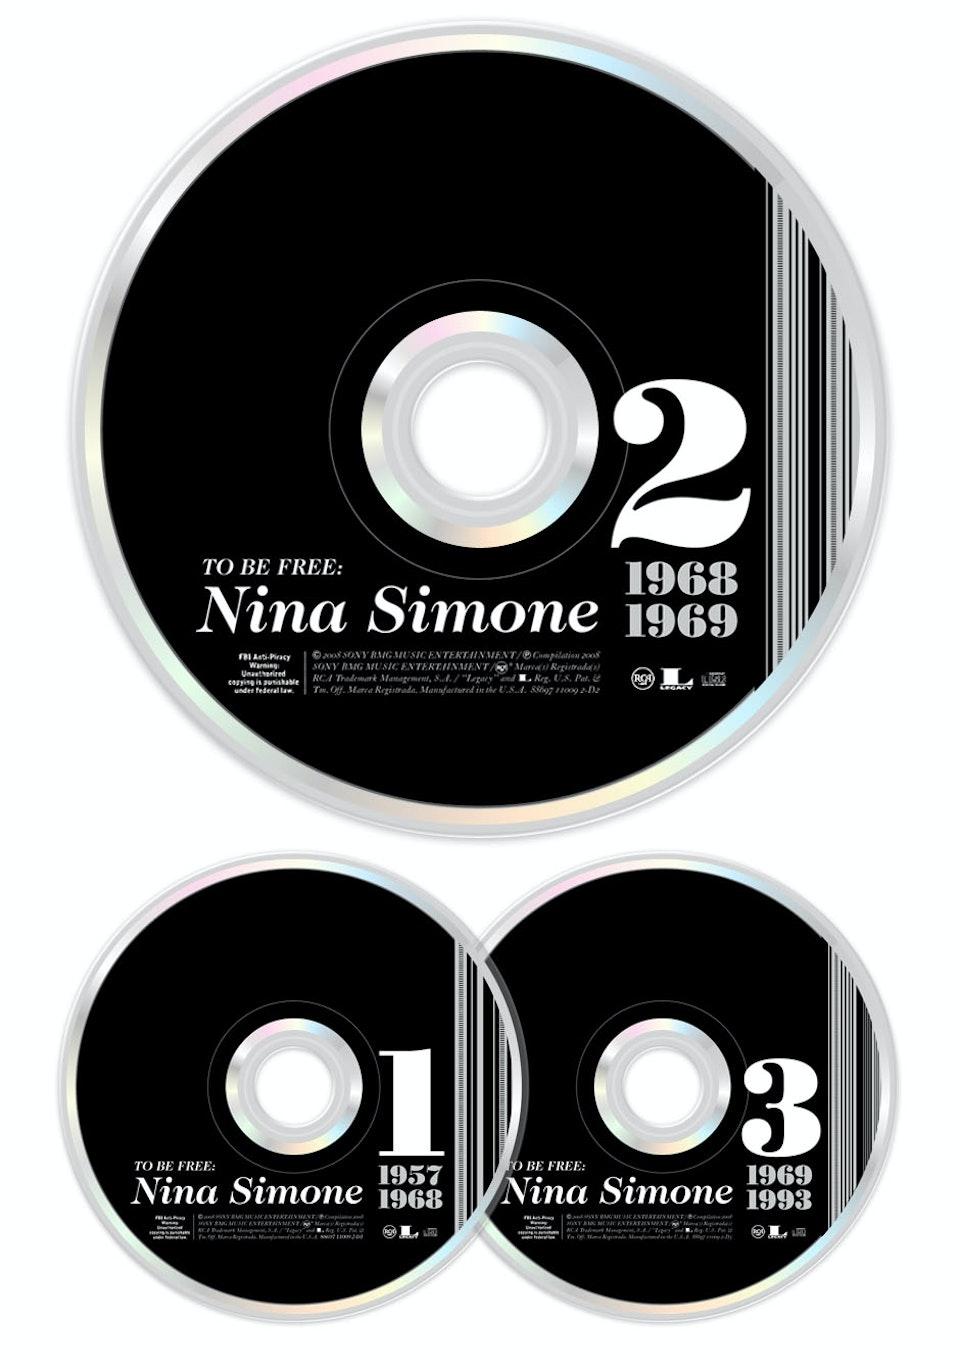 To Be Free: The Nina Simone Story - CD art